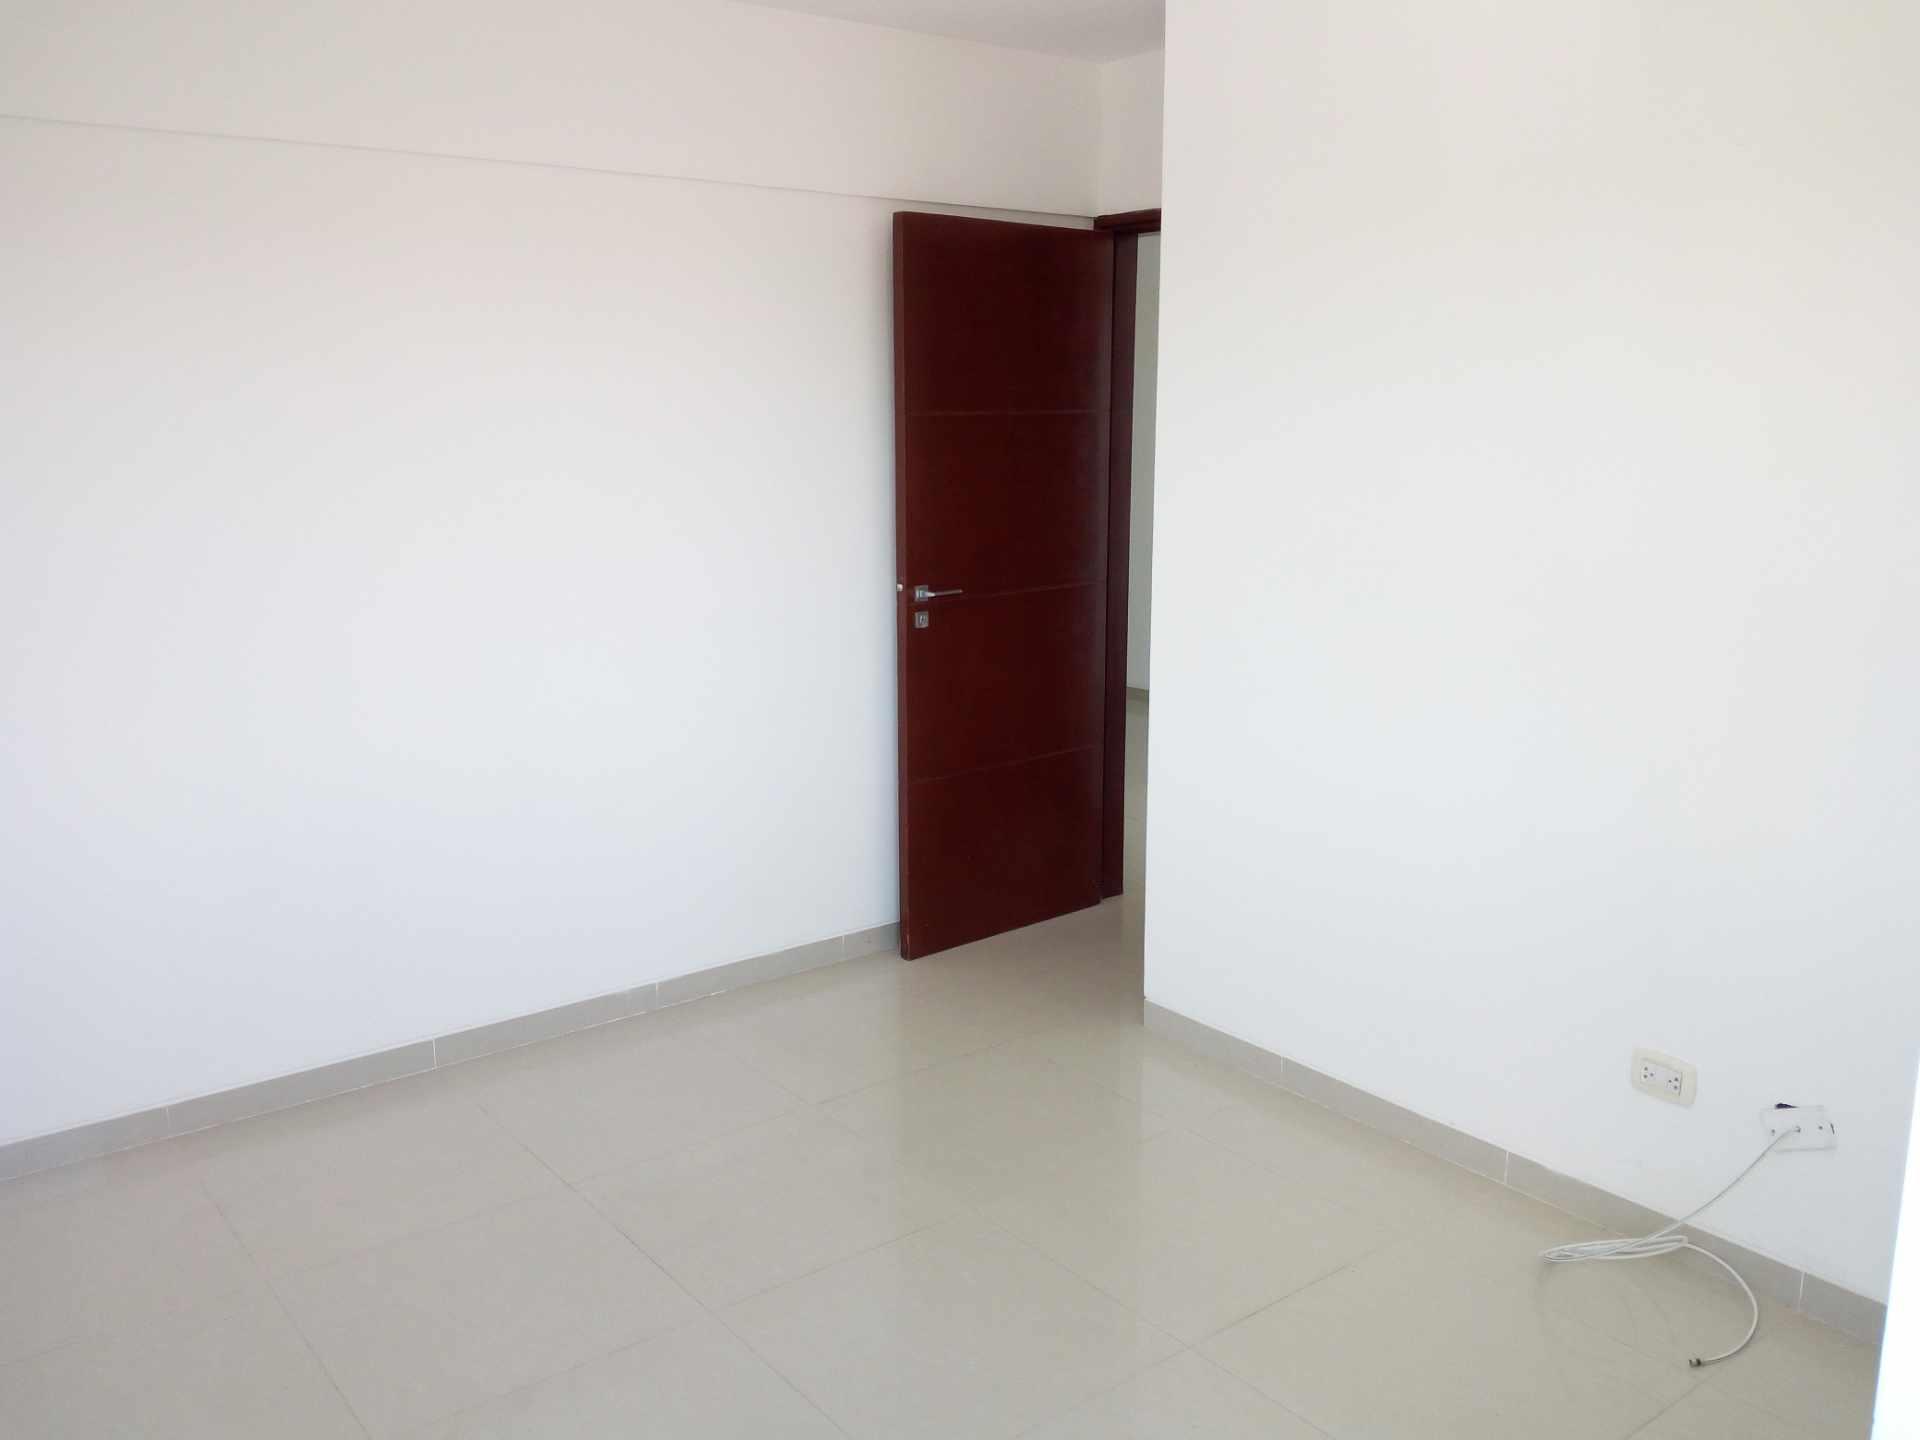 Departamento en Venta Entre 3er y 2do Anillo, Av. Guapay (Canal Cotoca) Foto 9